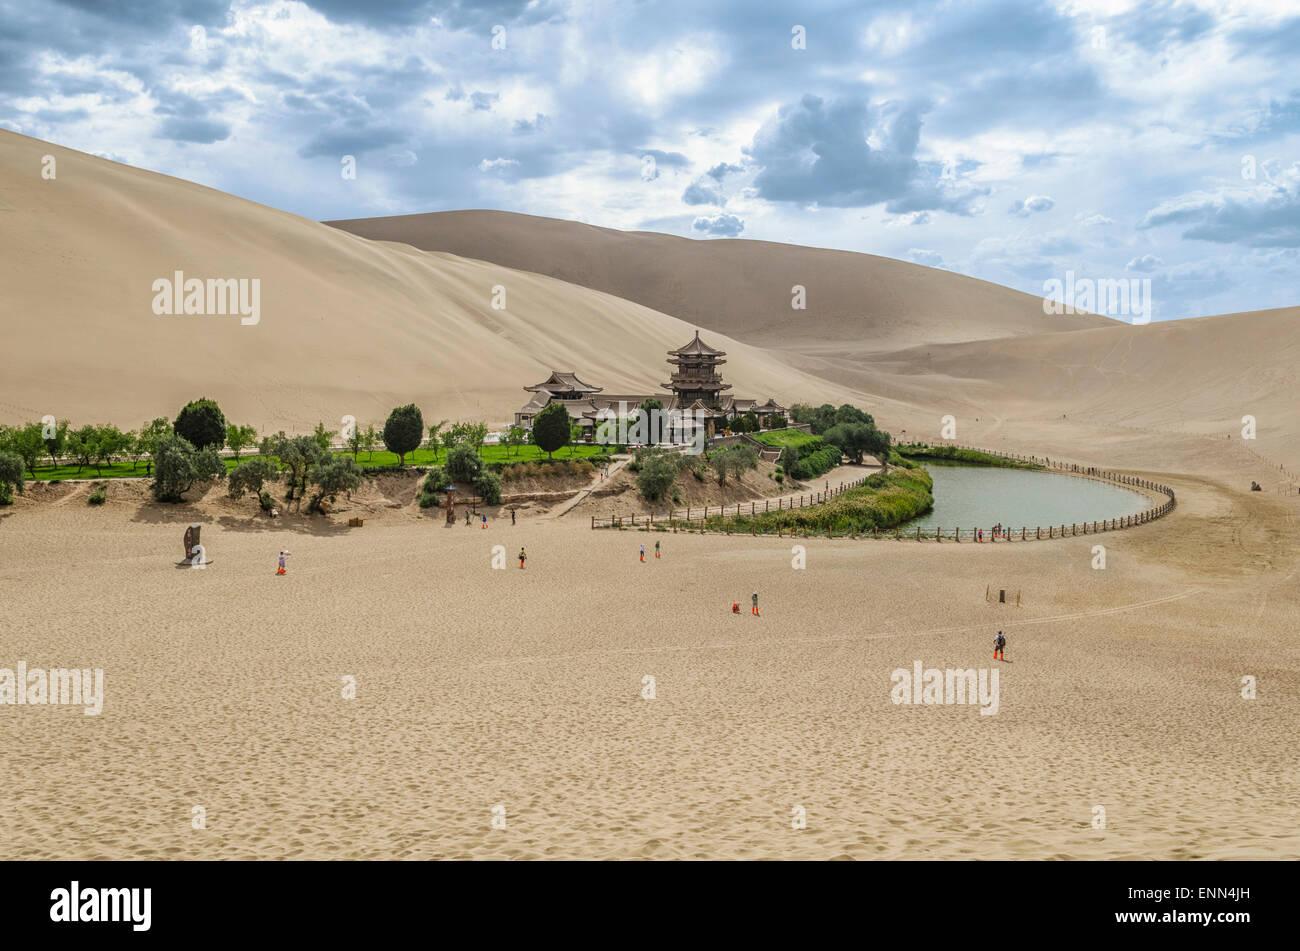 Crescent Lake, Dunhuang, Gansu Province, China - Stock Image